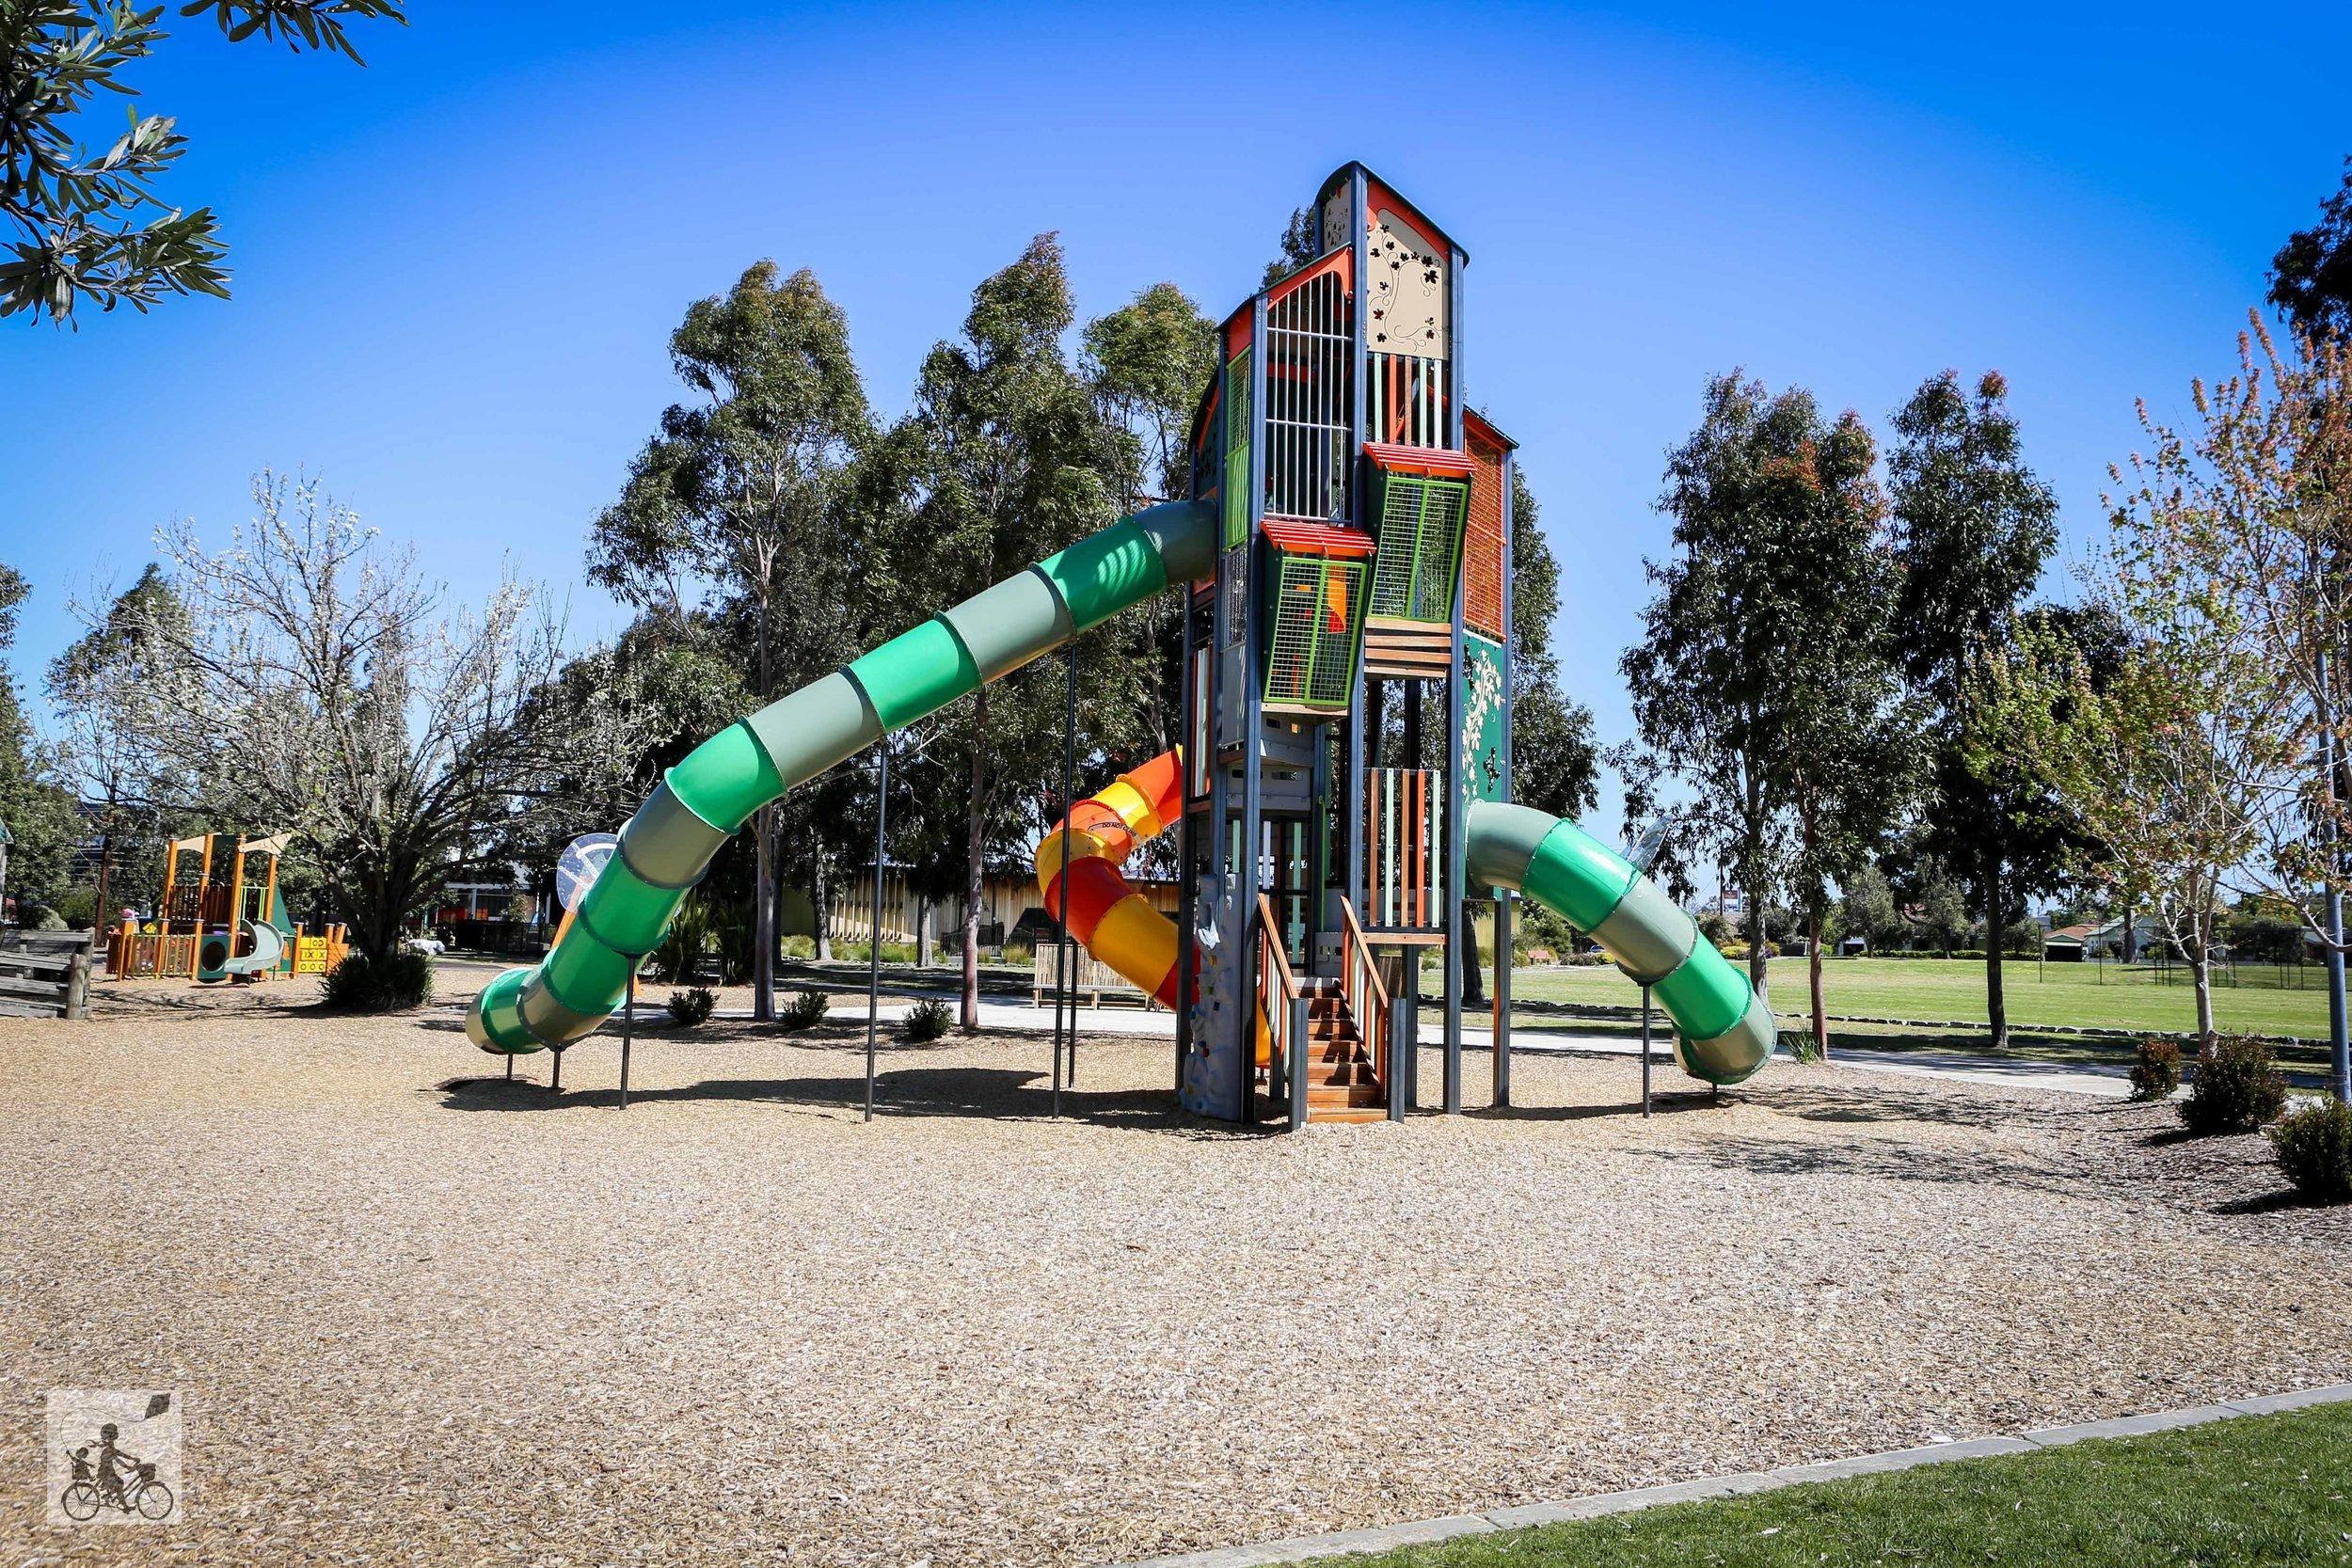 Cardinia Community Playground 2018 - Mamma Knows East (24 of 43).jpg